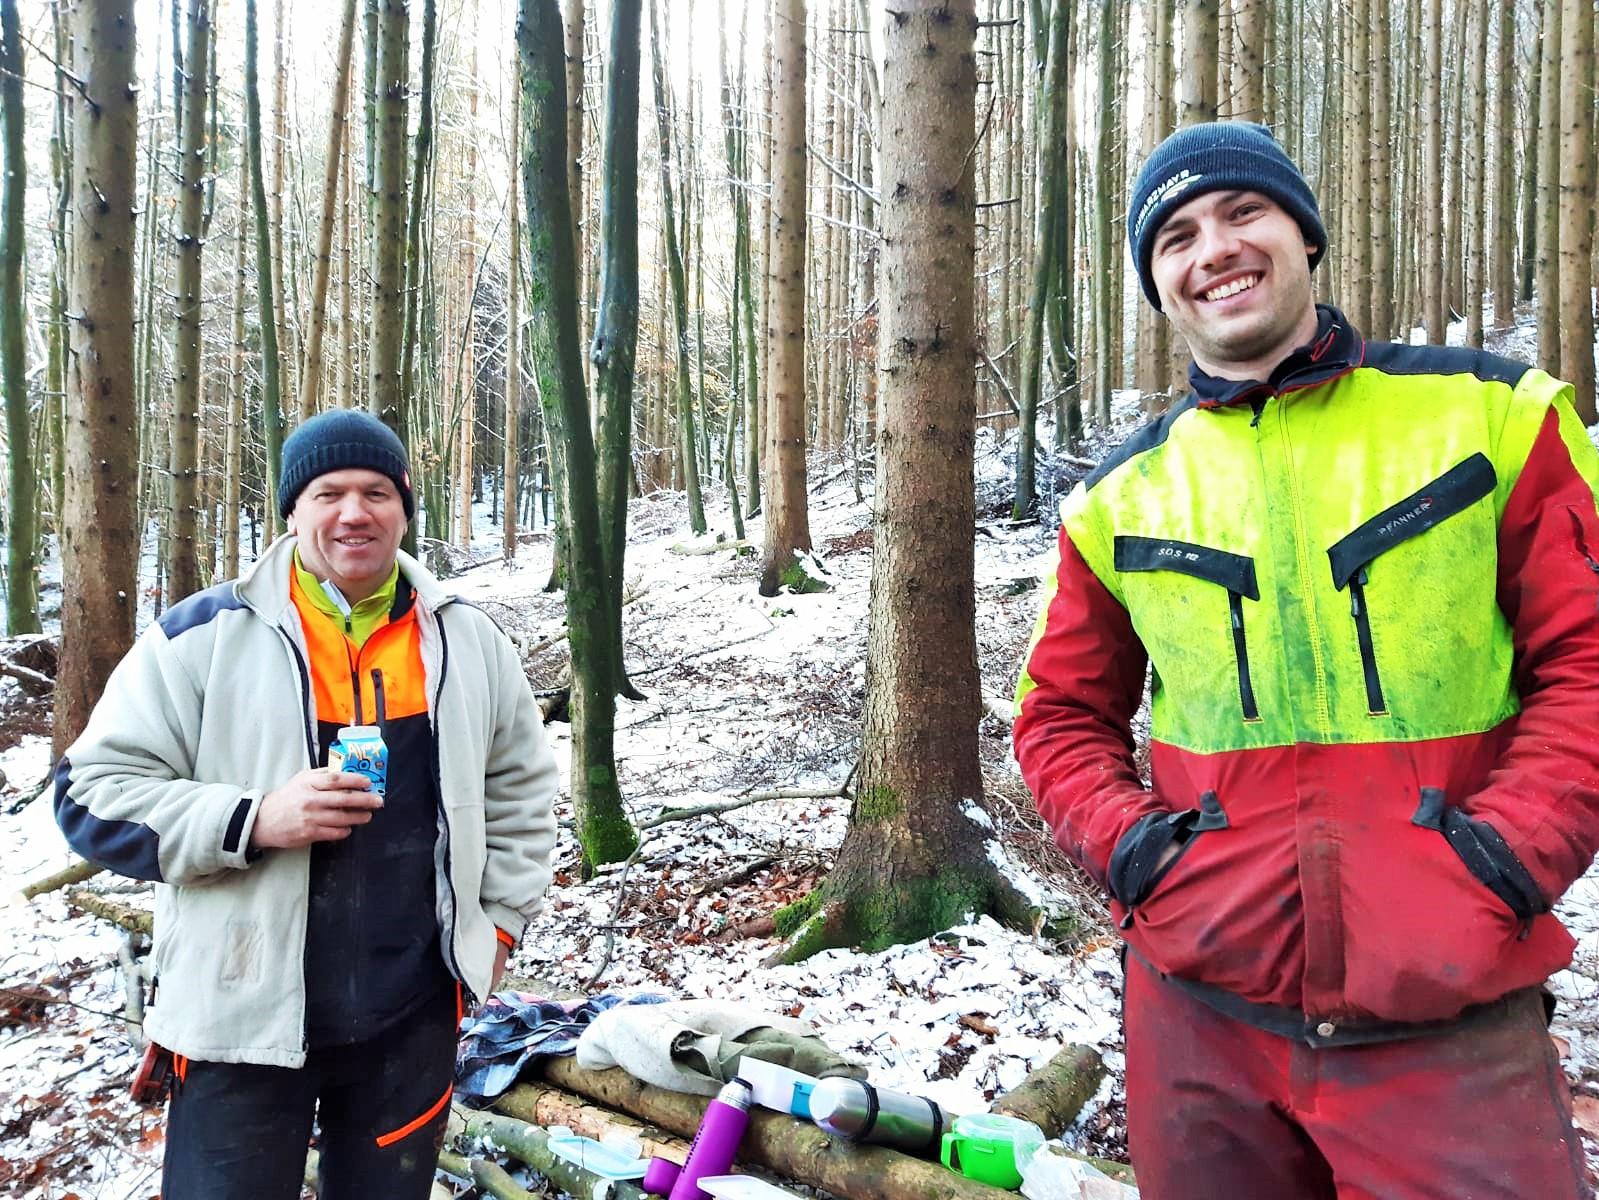 Waldpflegetraining